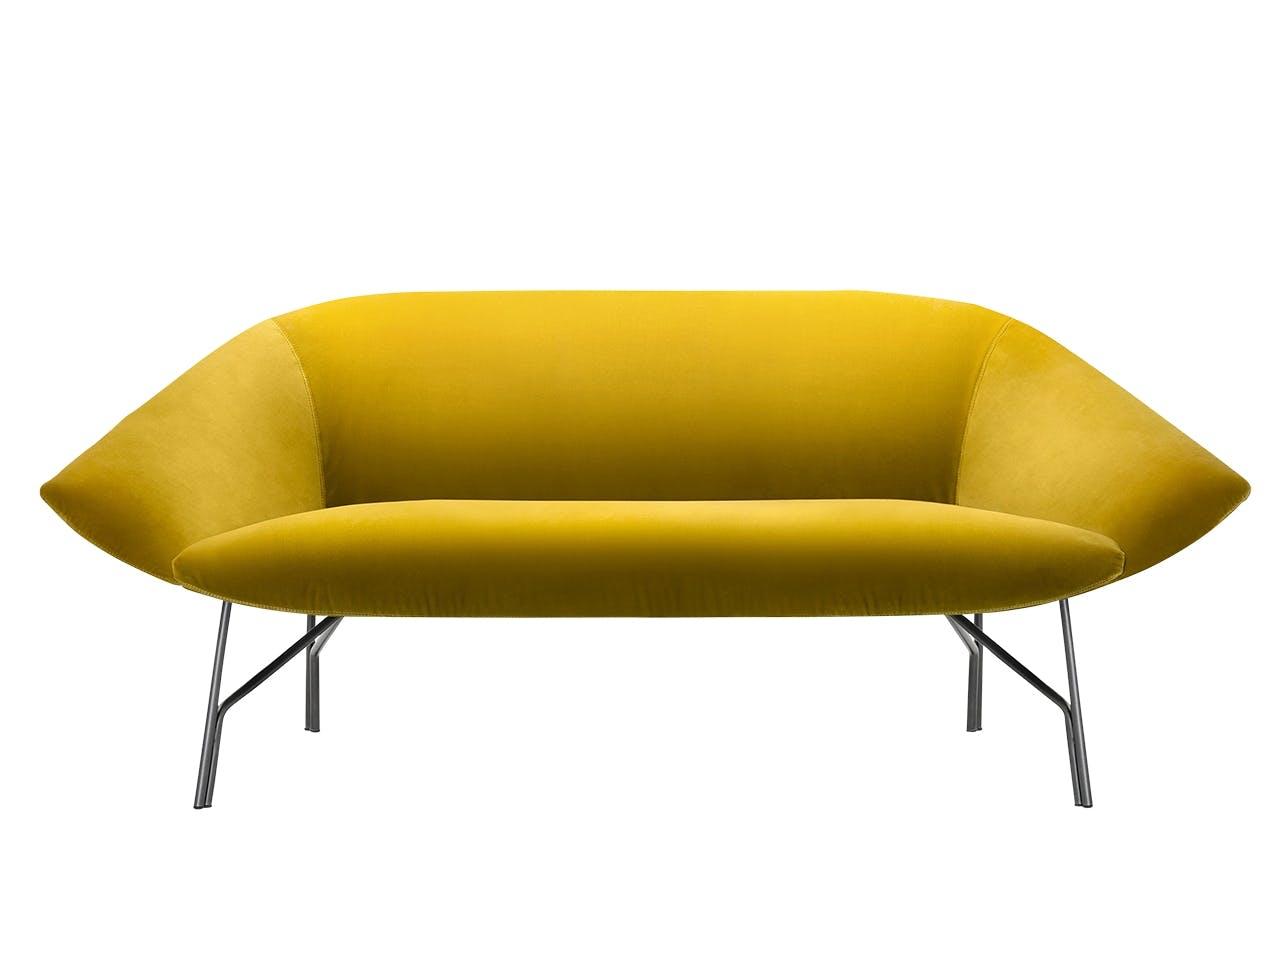 Spacemen Interior Architecture sofa af gordon Guillaumier for Lema